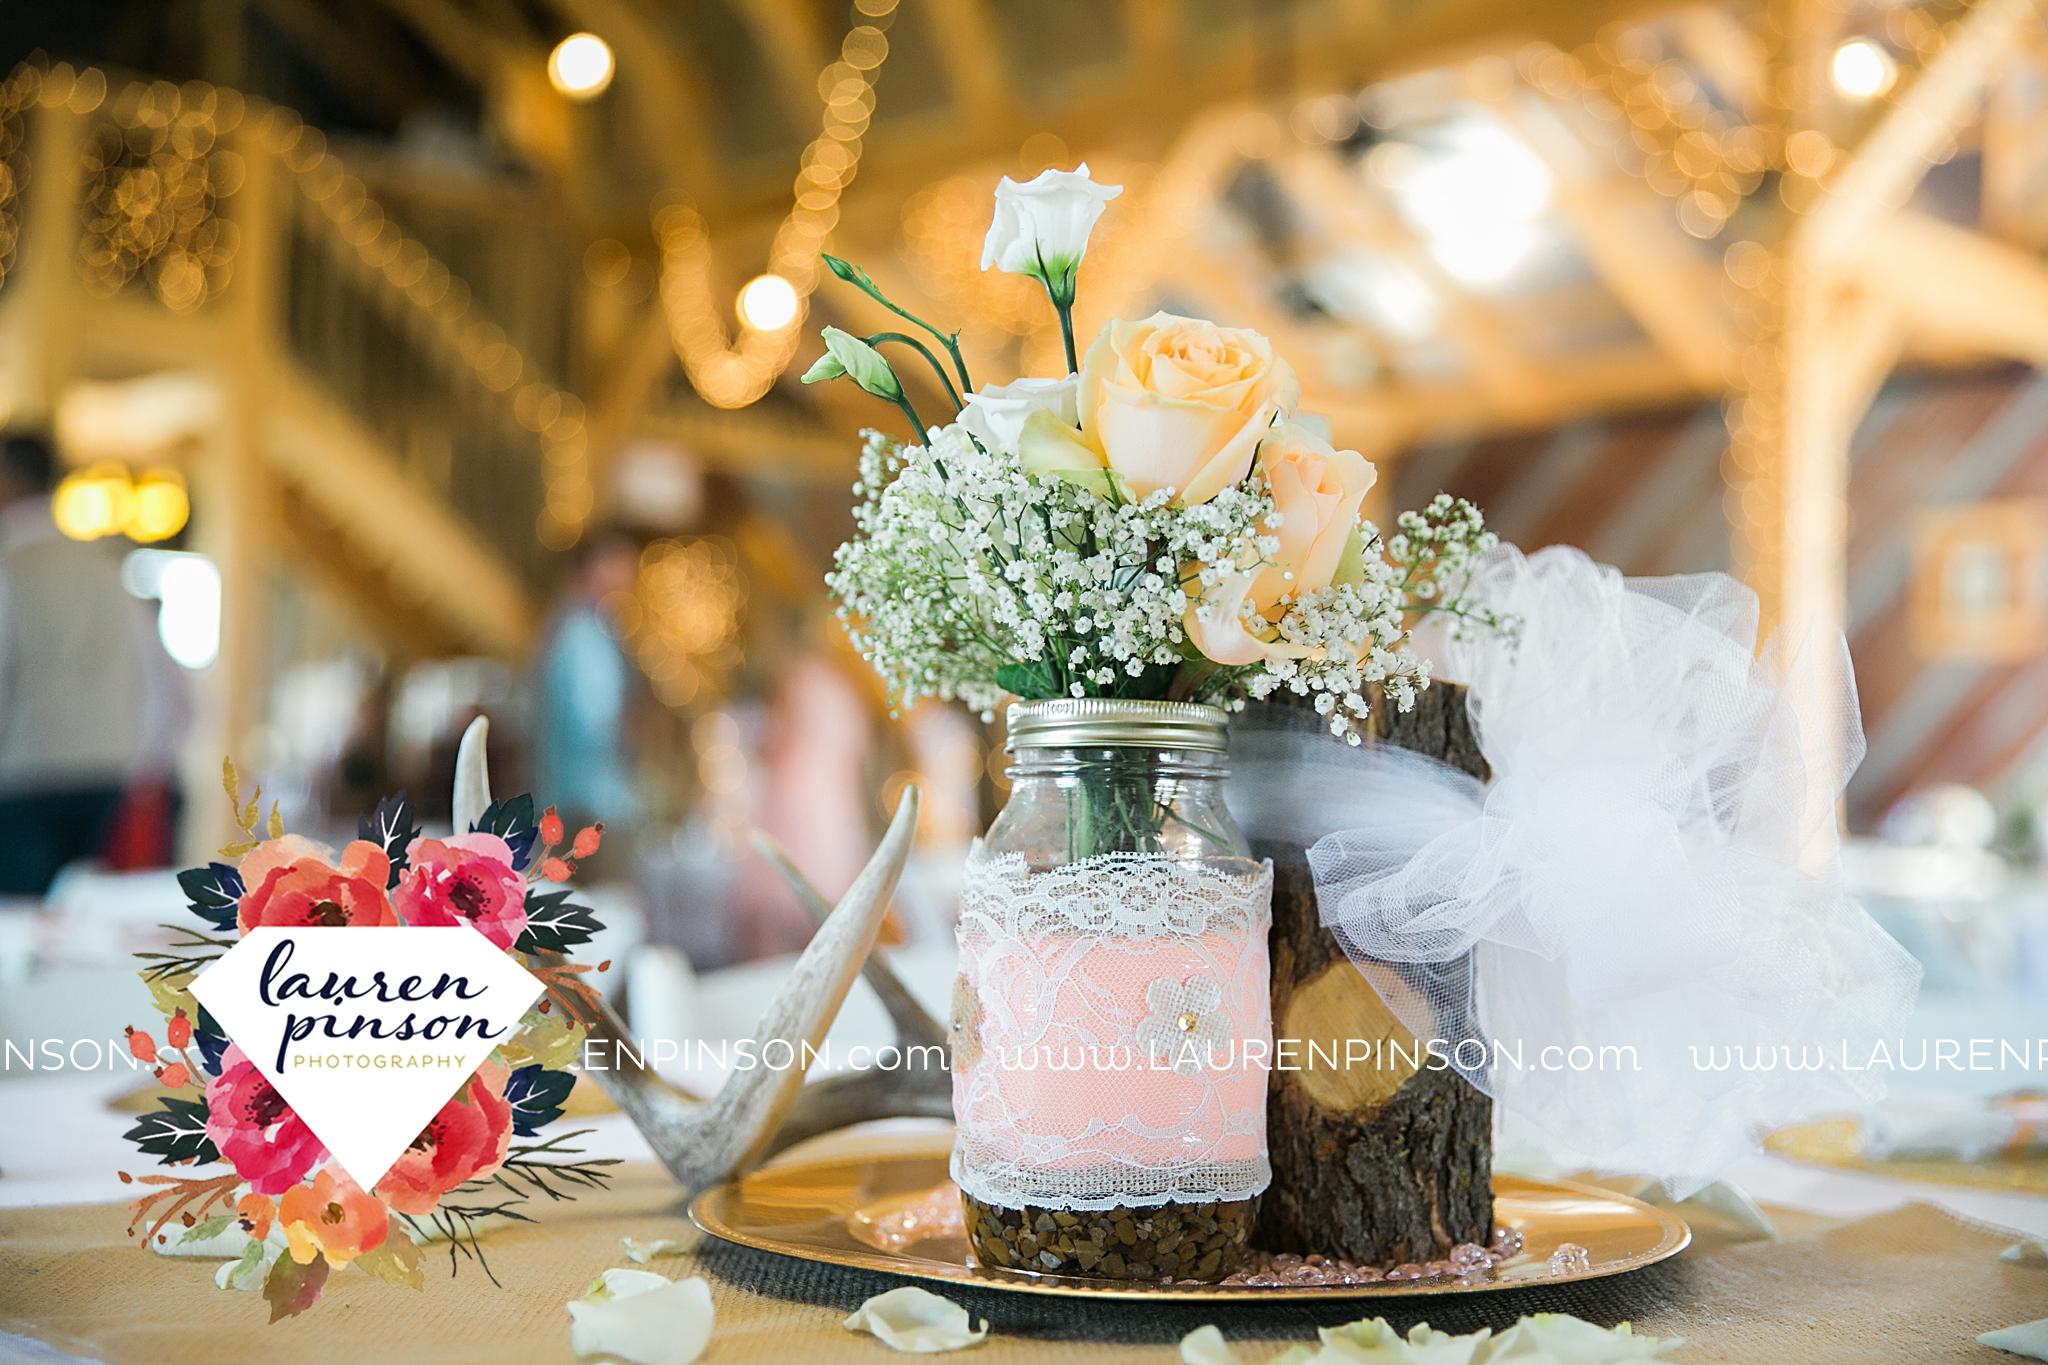 jones-barn-willow-creek-ranch-wedding-in-cleburne-texas-fort-worth-dfw-wichita-falls-wedding-photography_3236.jpg